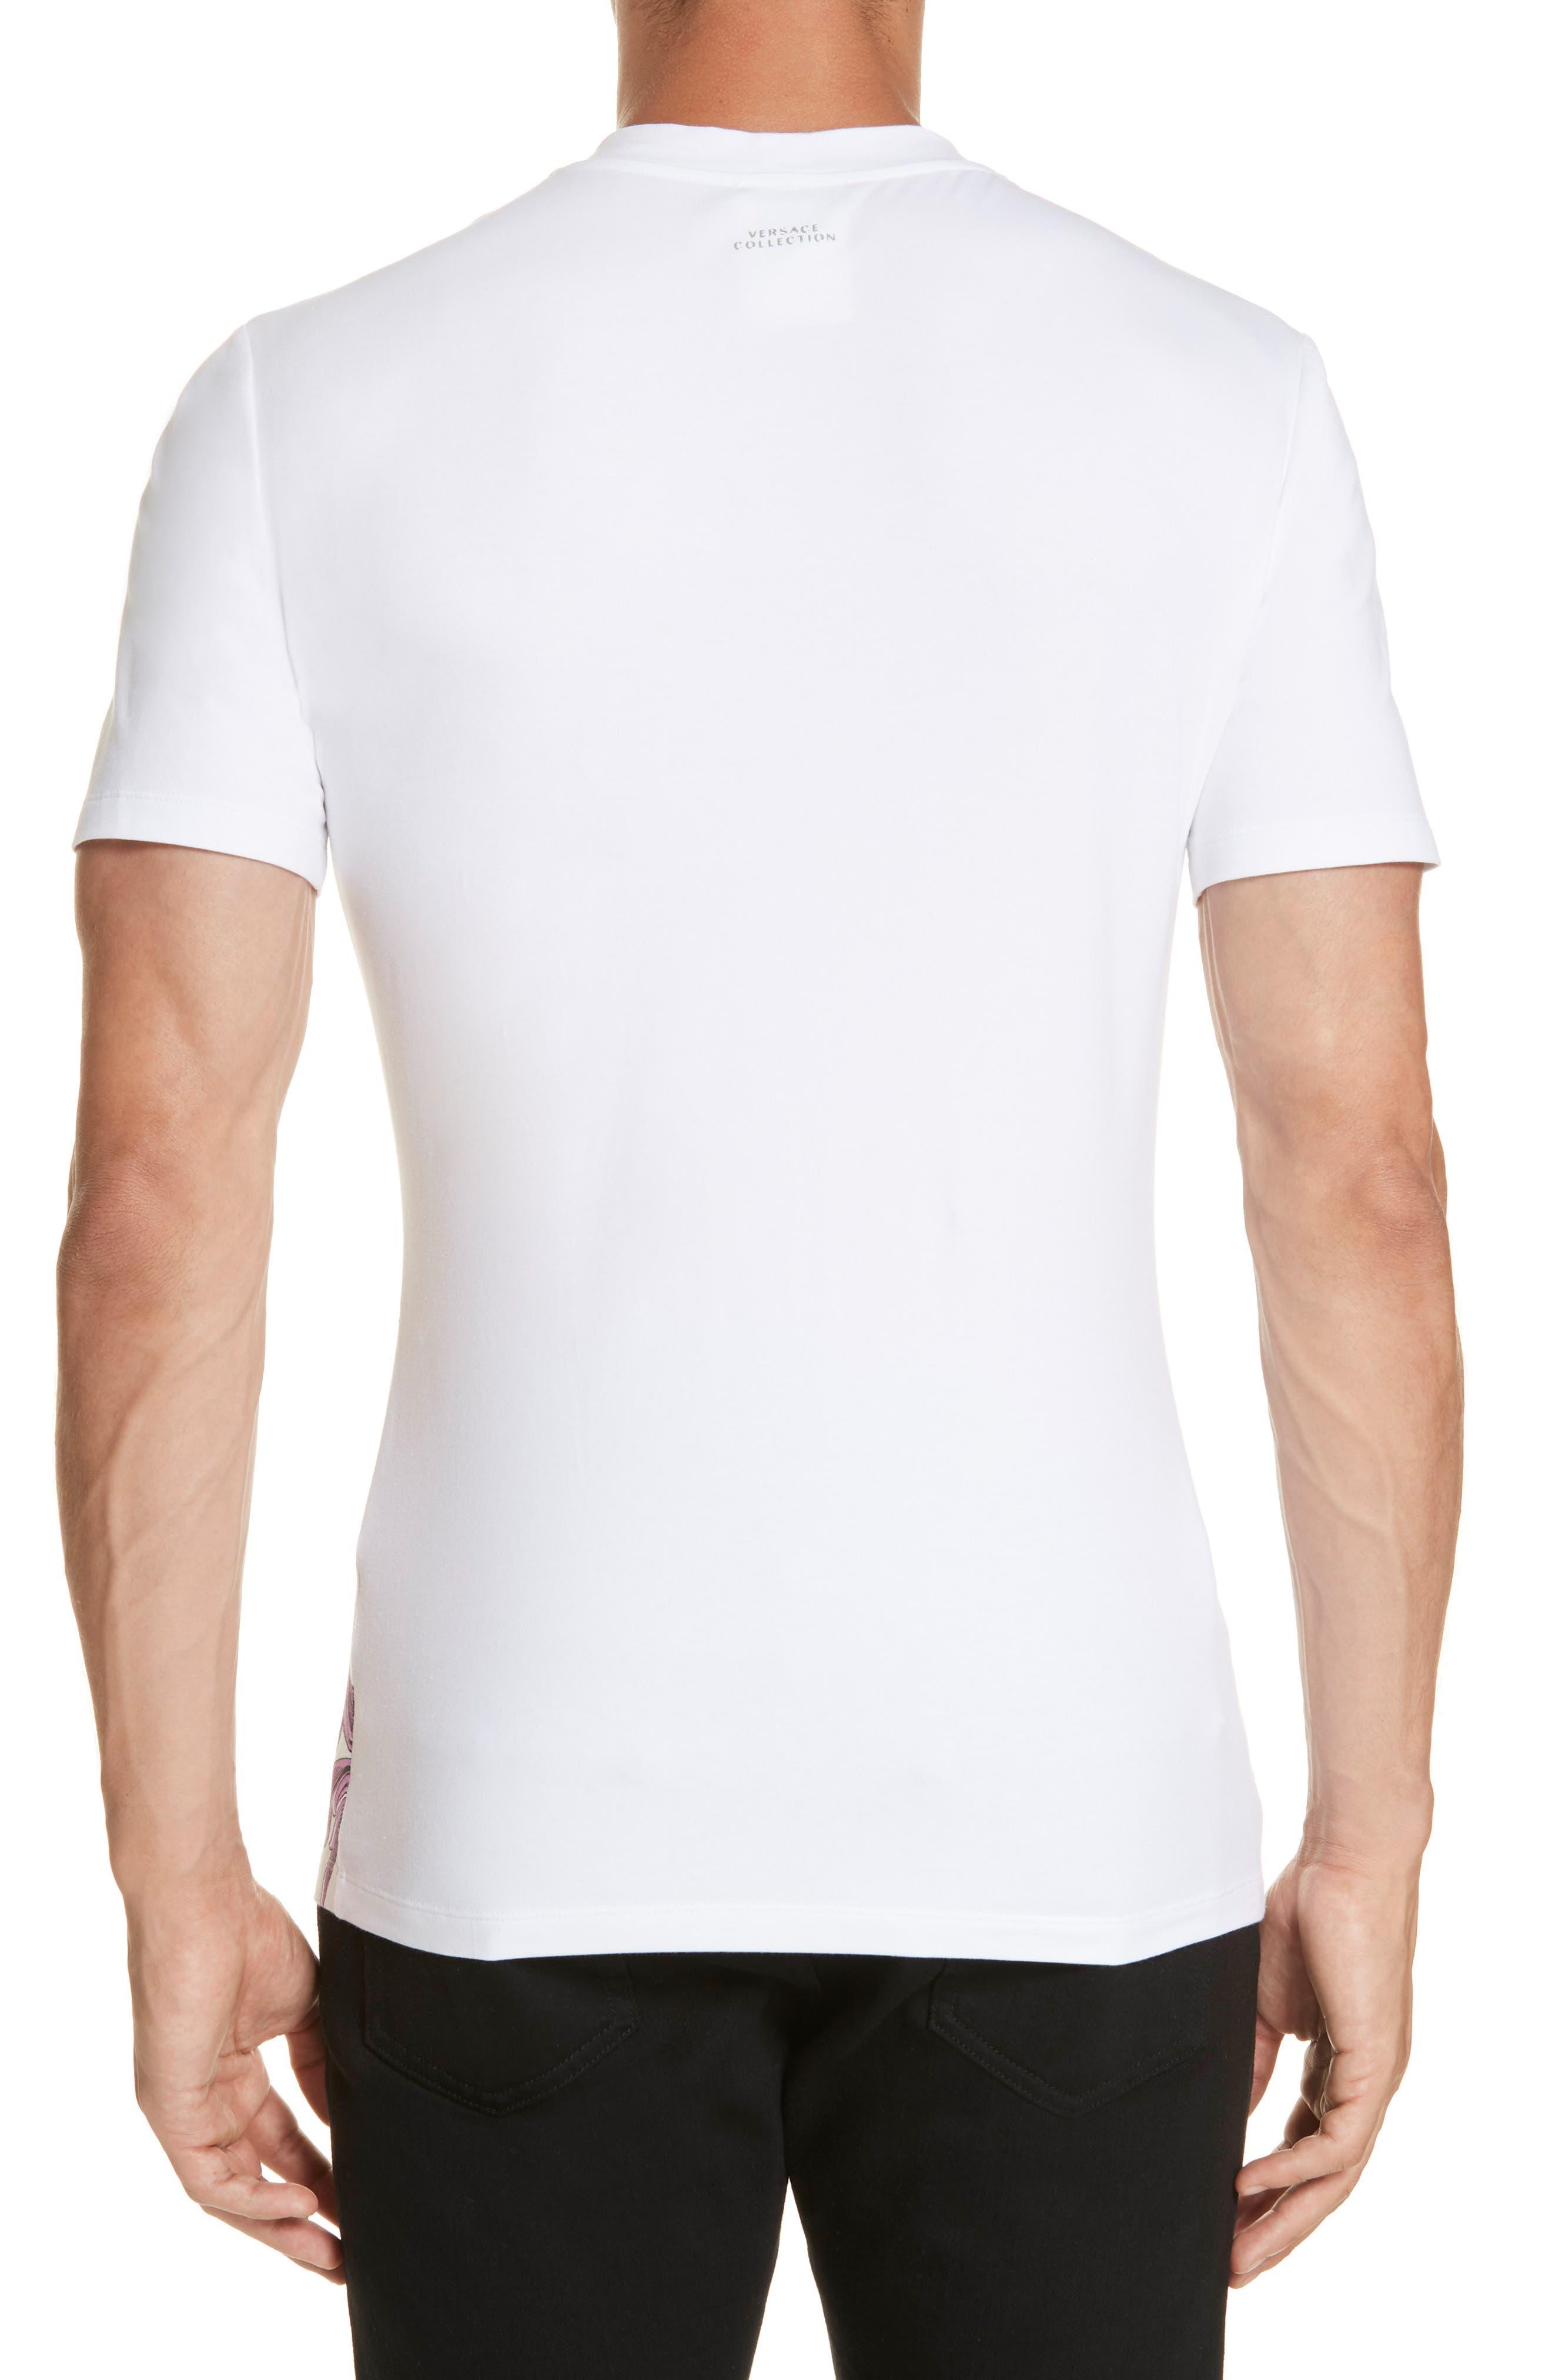 VERSACE COLLECTION, Filigree Print T-Shirt, Alternate thumbnail 2, color, 100